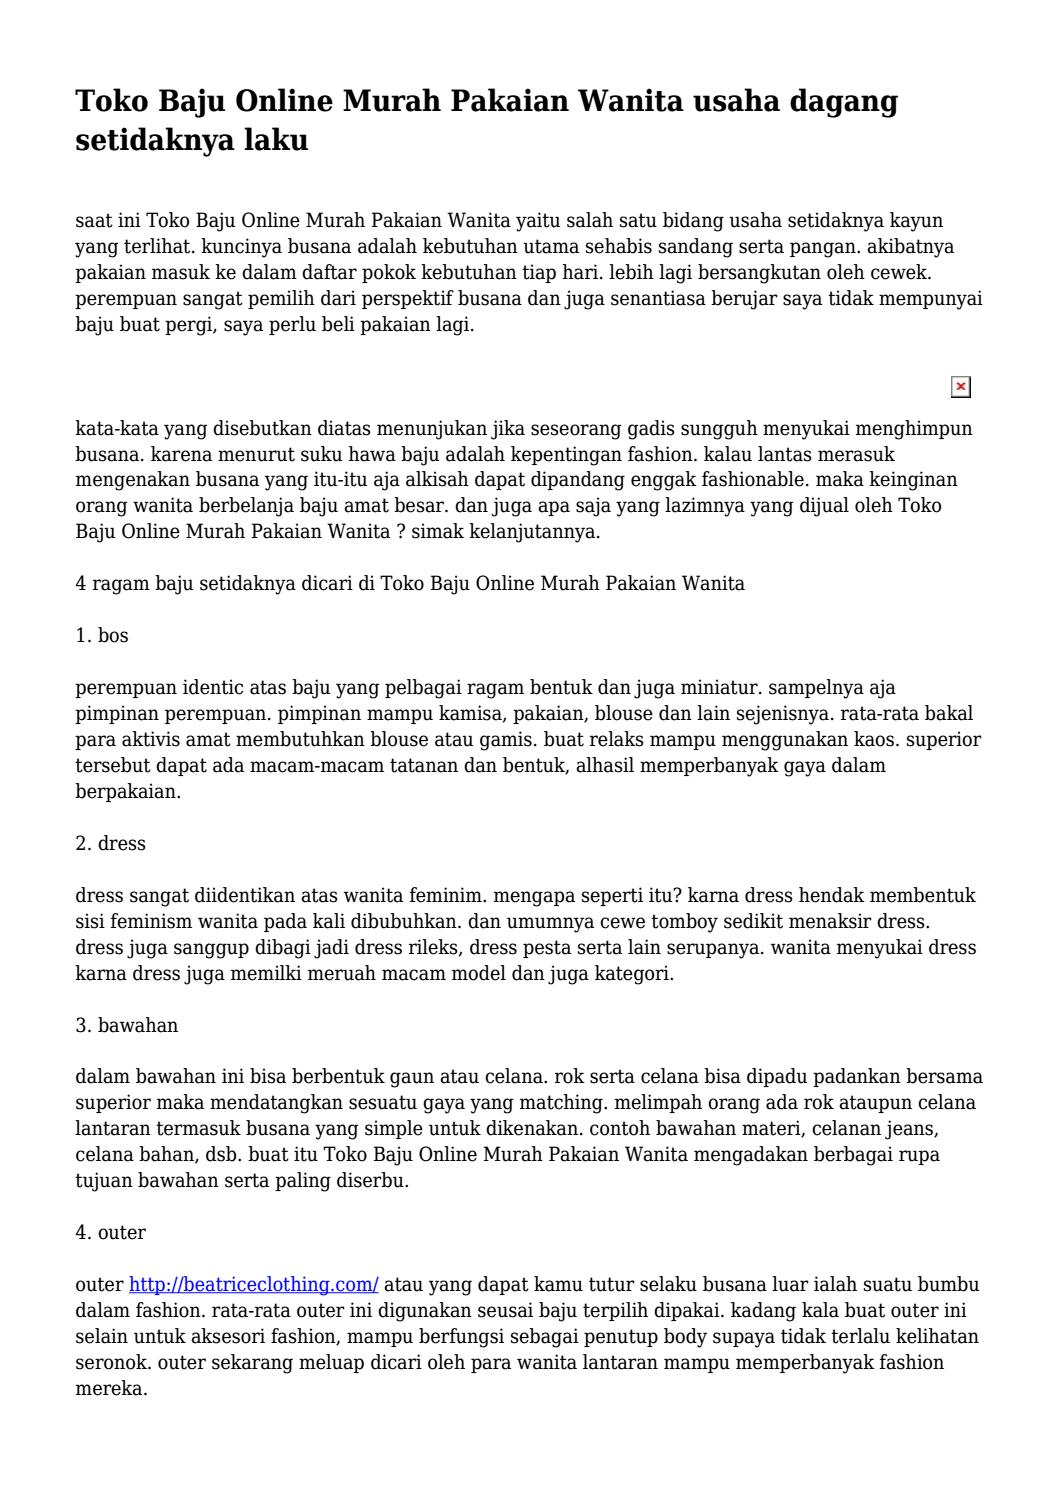 Toko Baju Online Murah Pakaian Wanita usaha dagang setidaknya laku... by  ethangoodson297 - issuu cc97ebe9cb